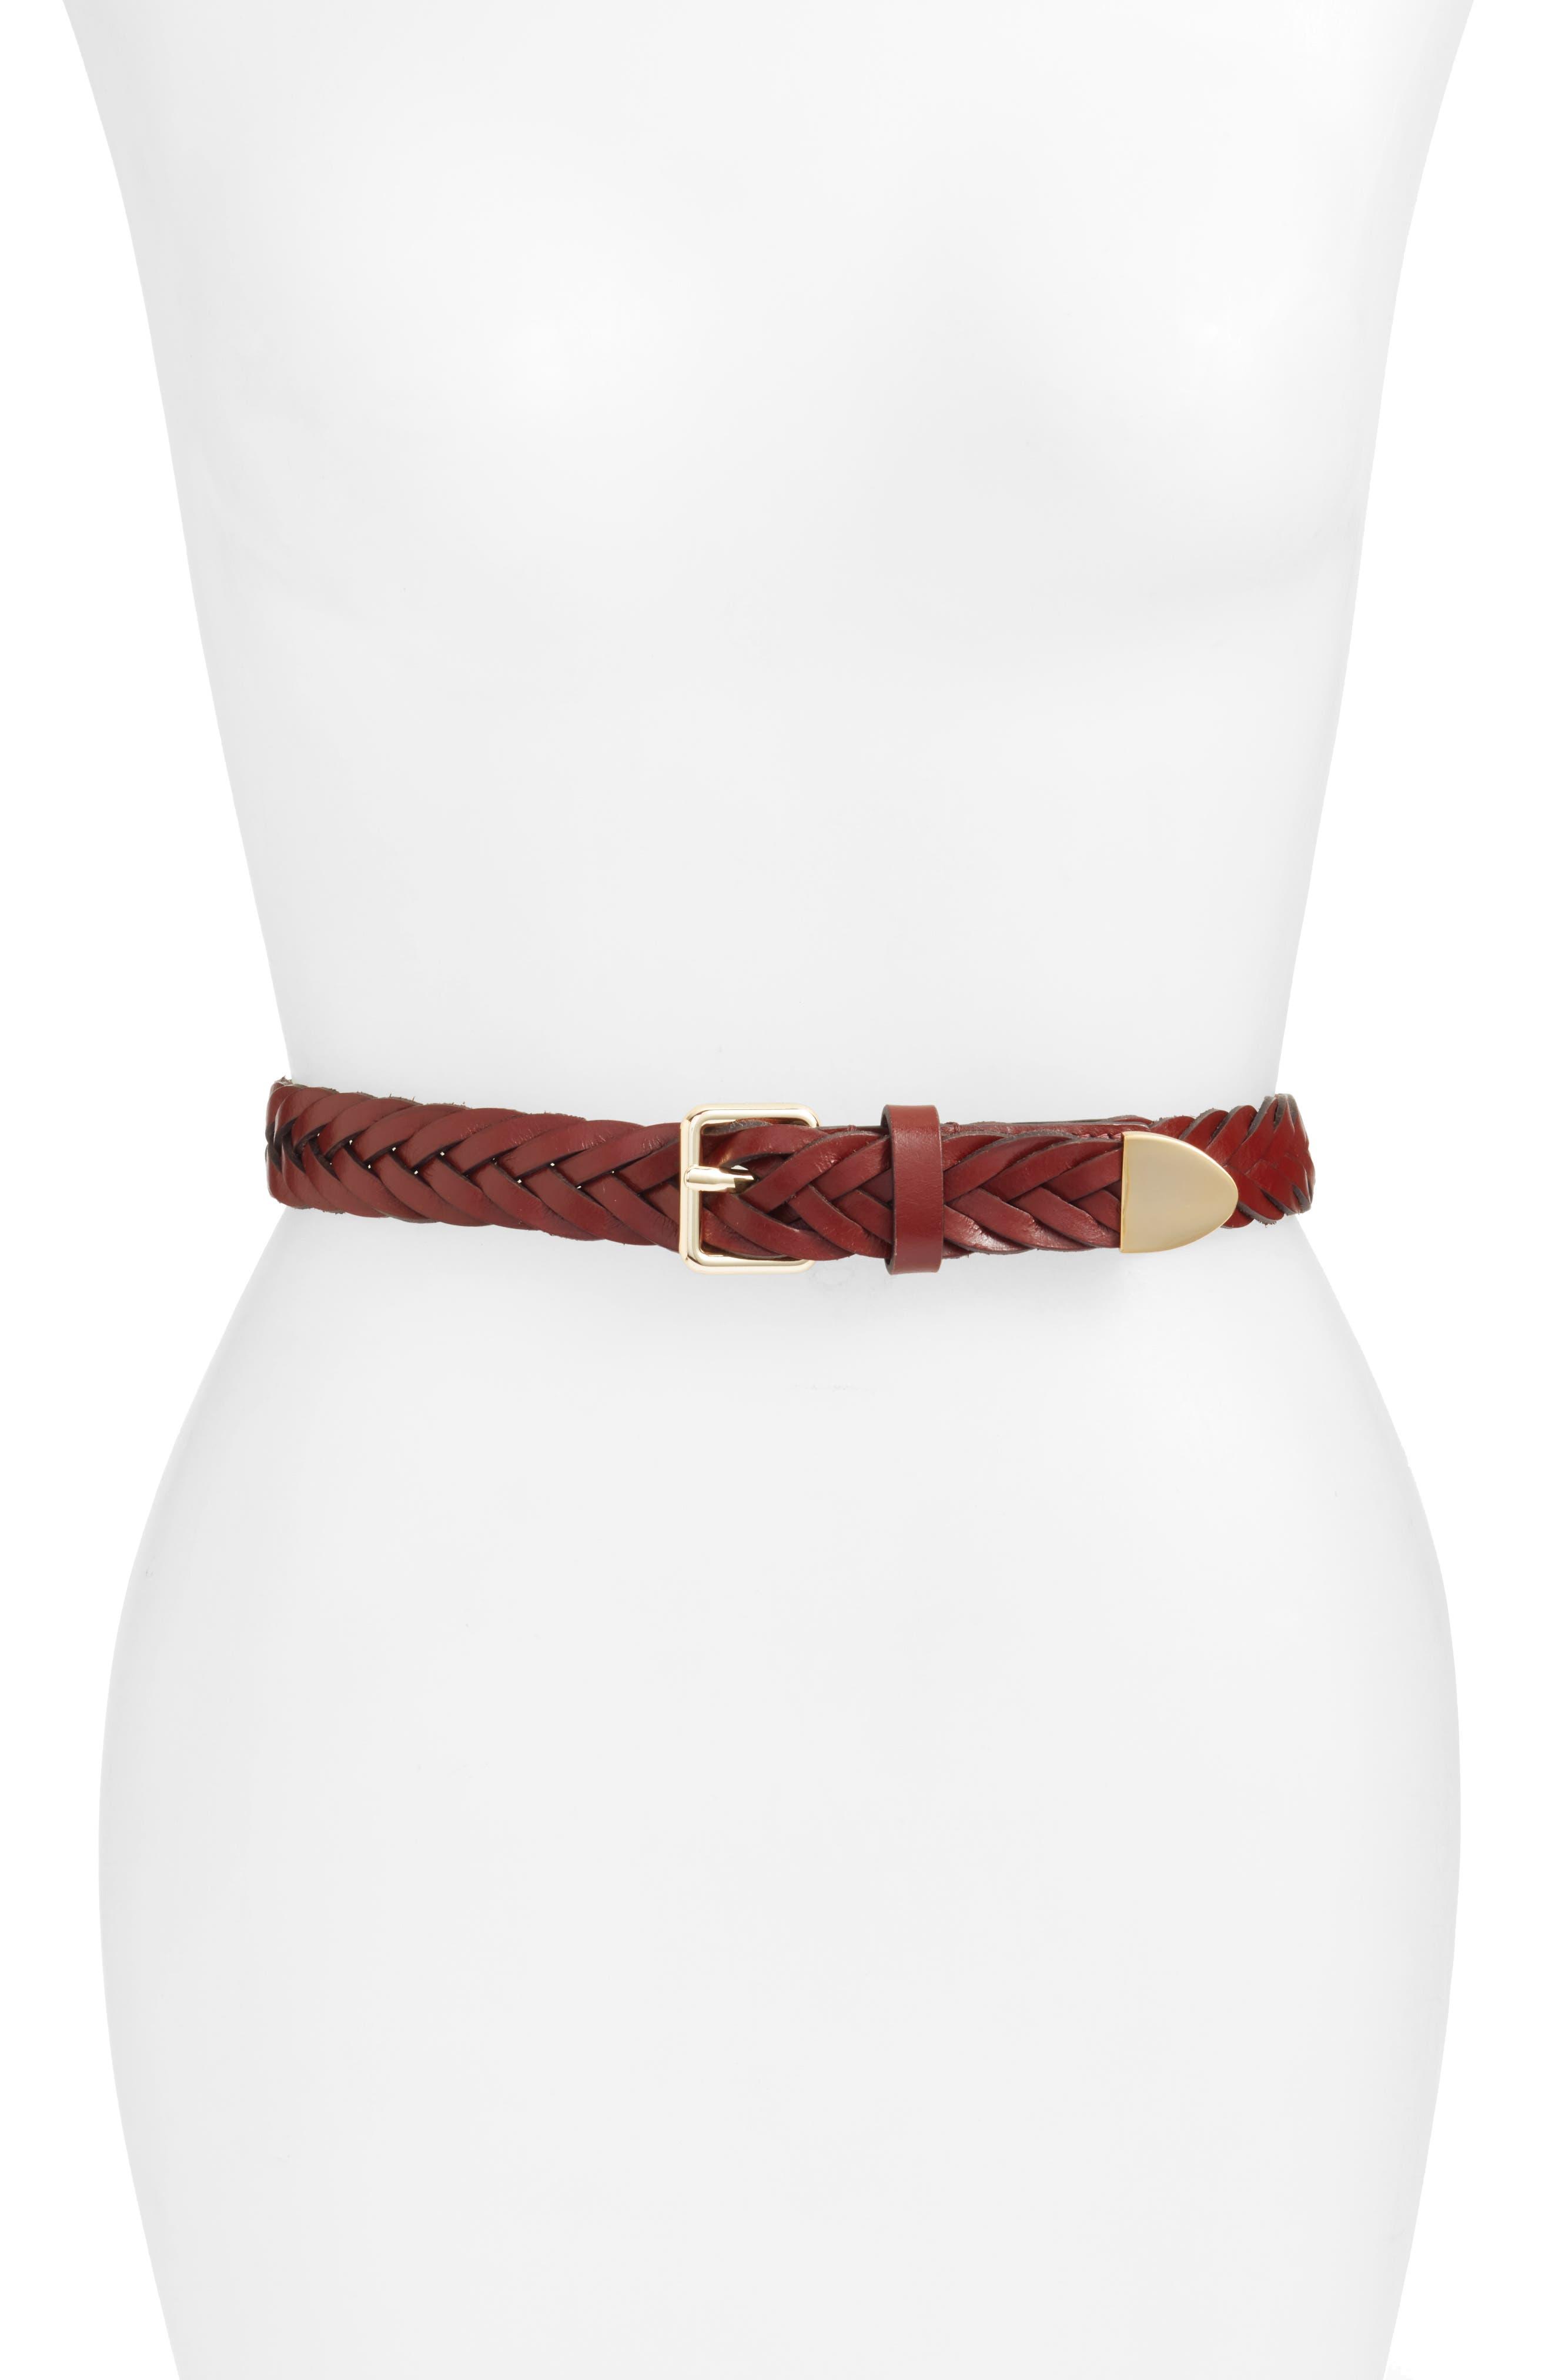 Braided Leather Belt, Luggage / Pol Gold